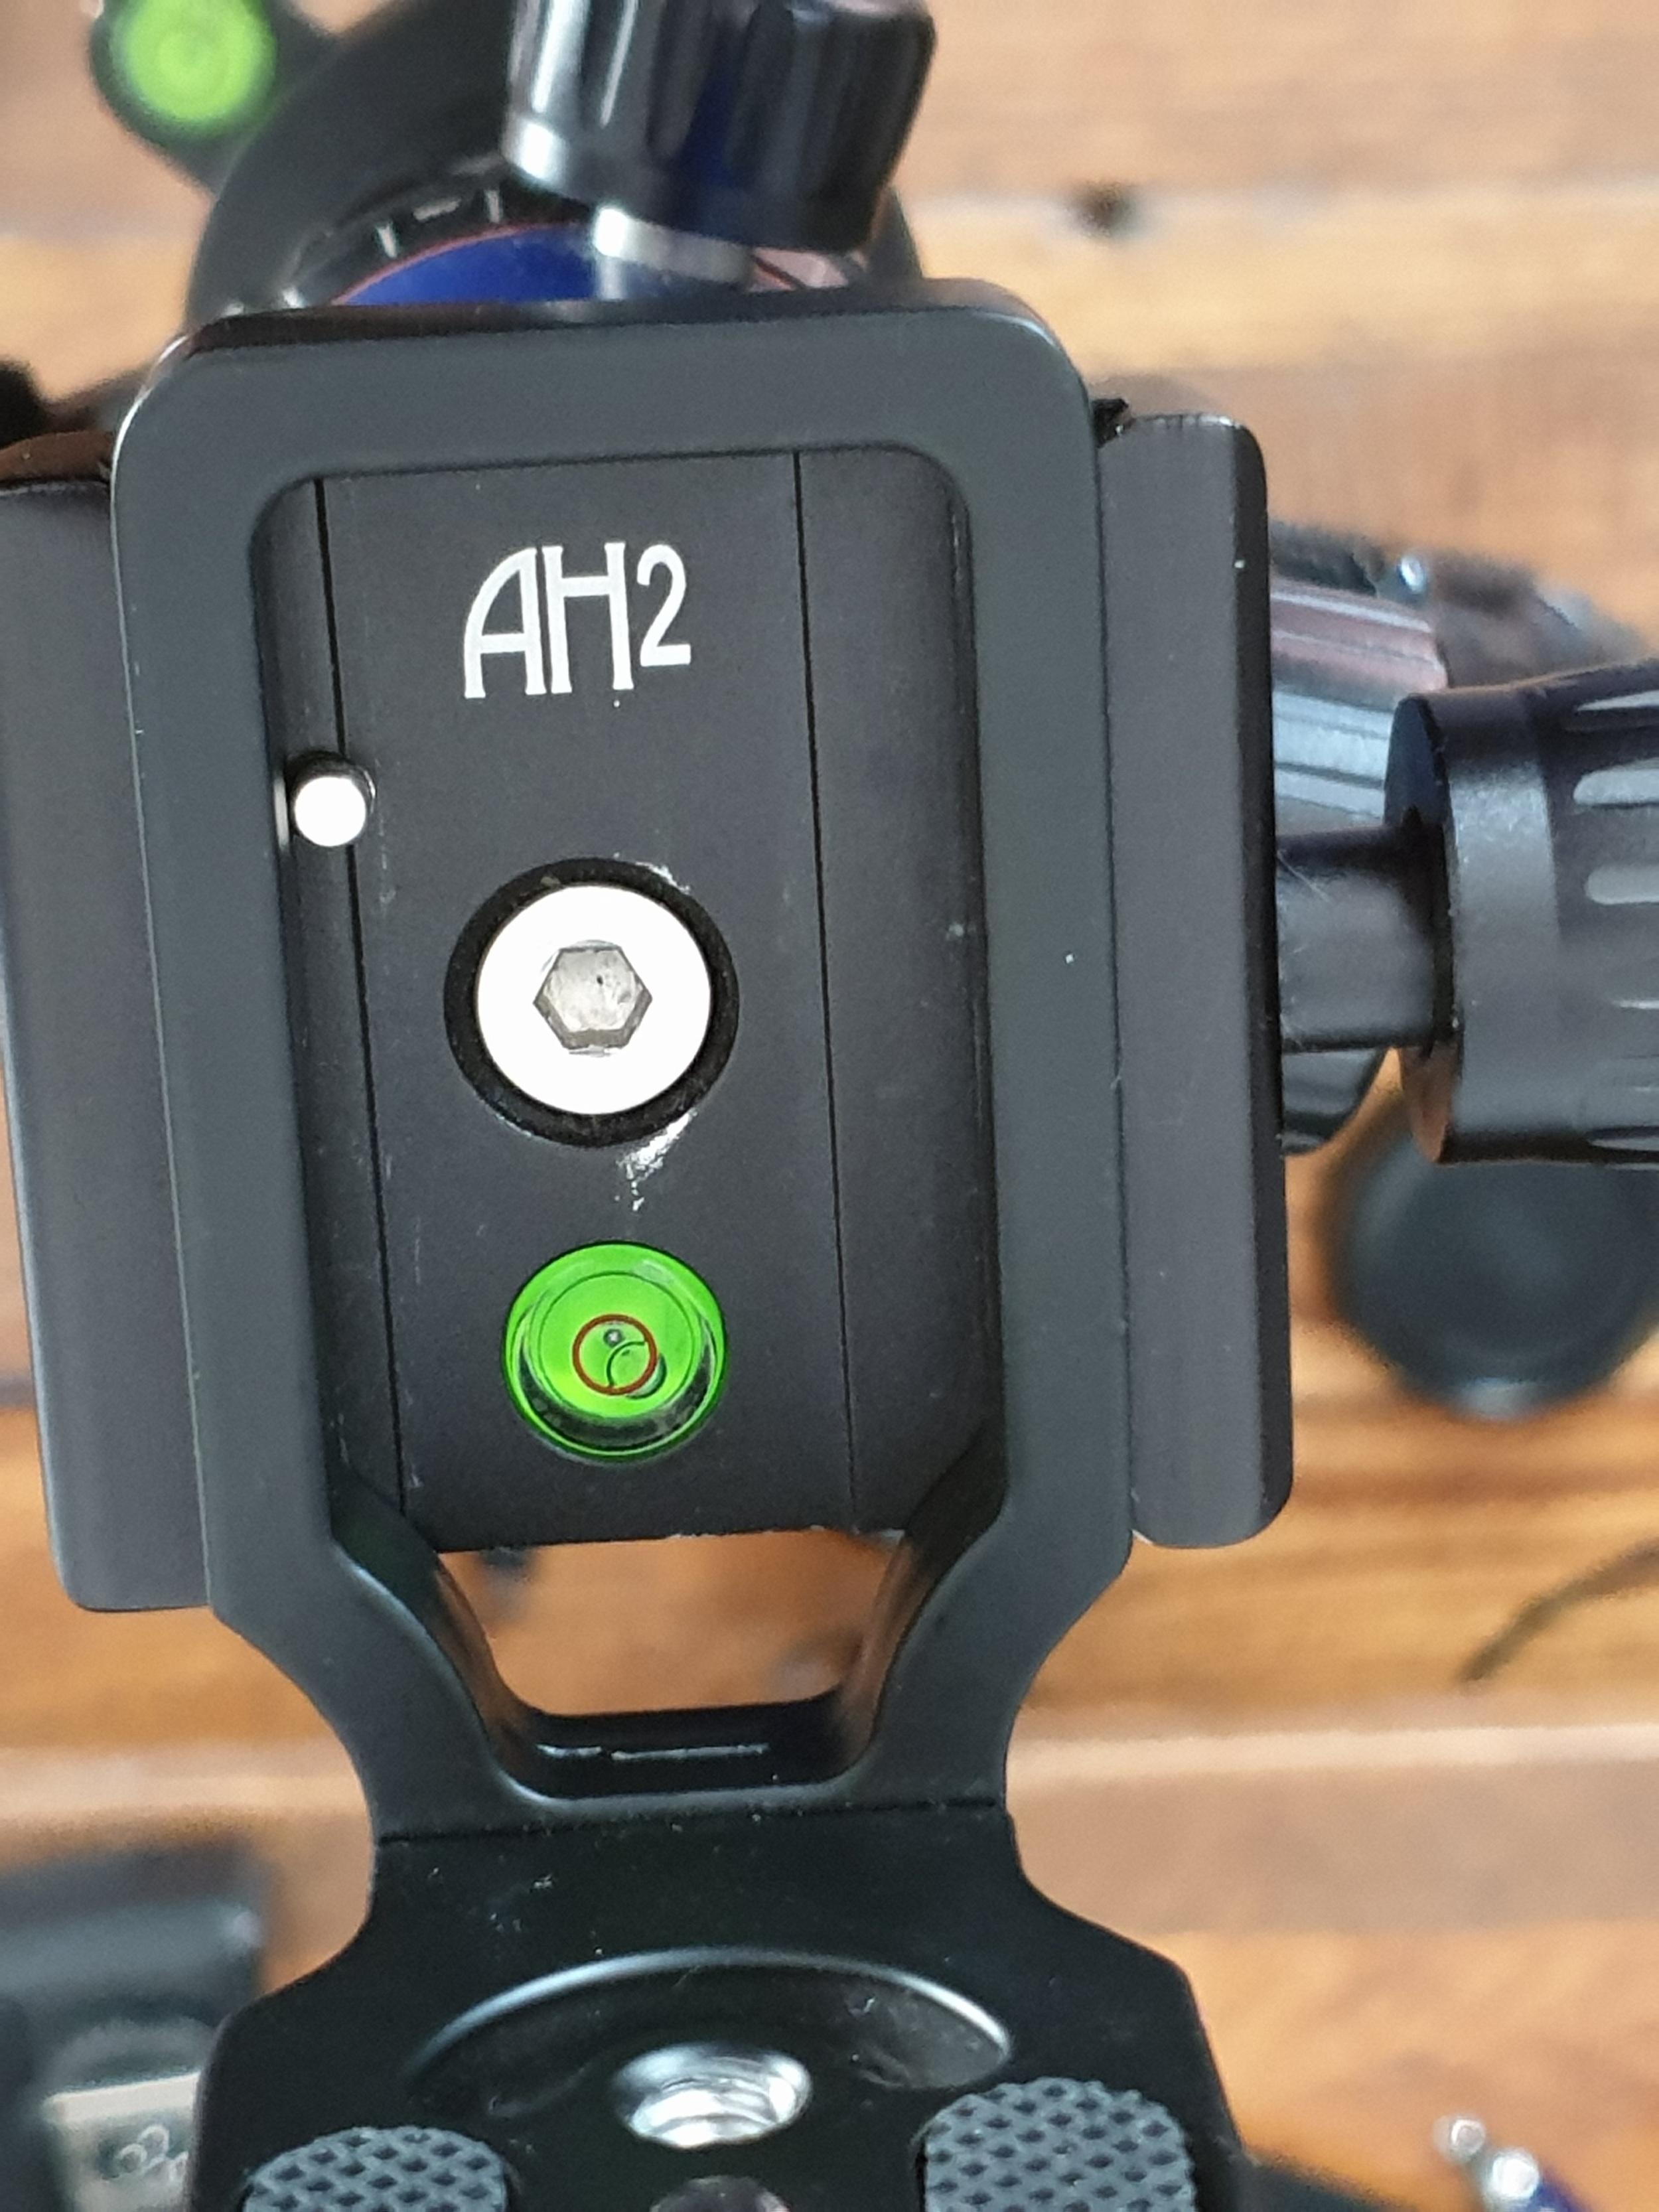 Andoer L bracket on 3LT tripod AH2 ball head with pin popping through